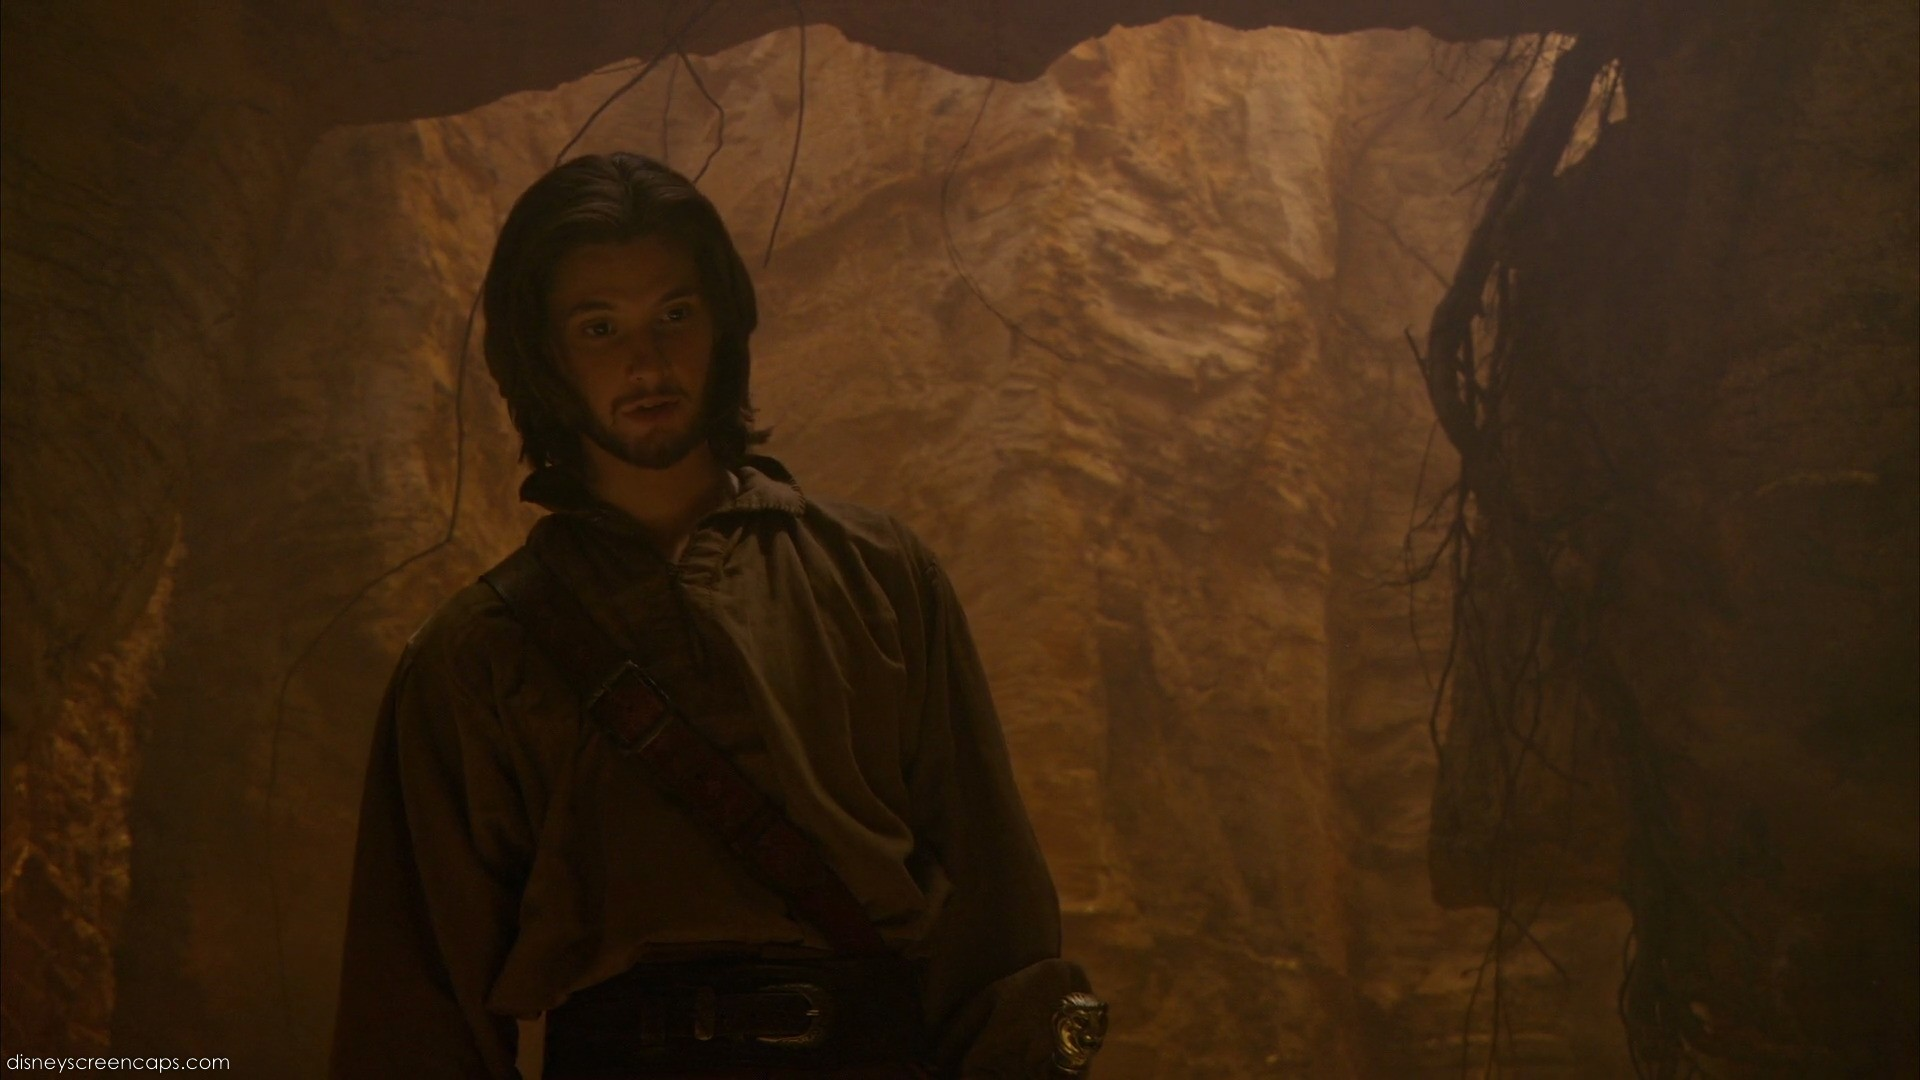 Caspian in The Voyage of the Dawn Treader - Ben Barnes ...